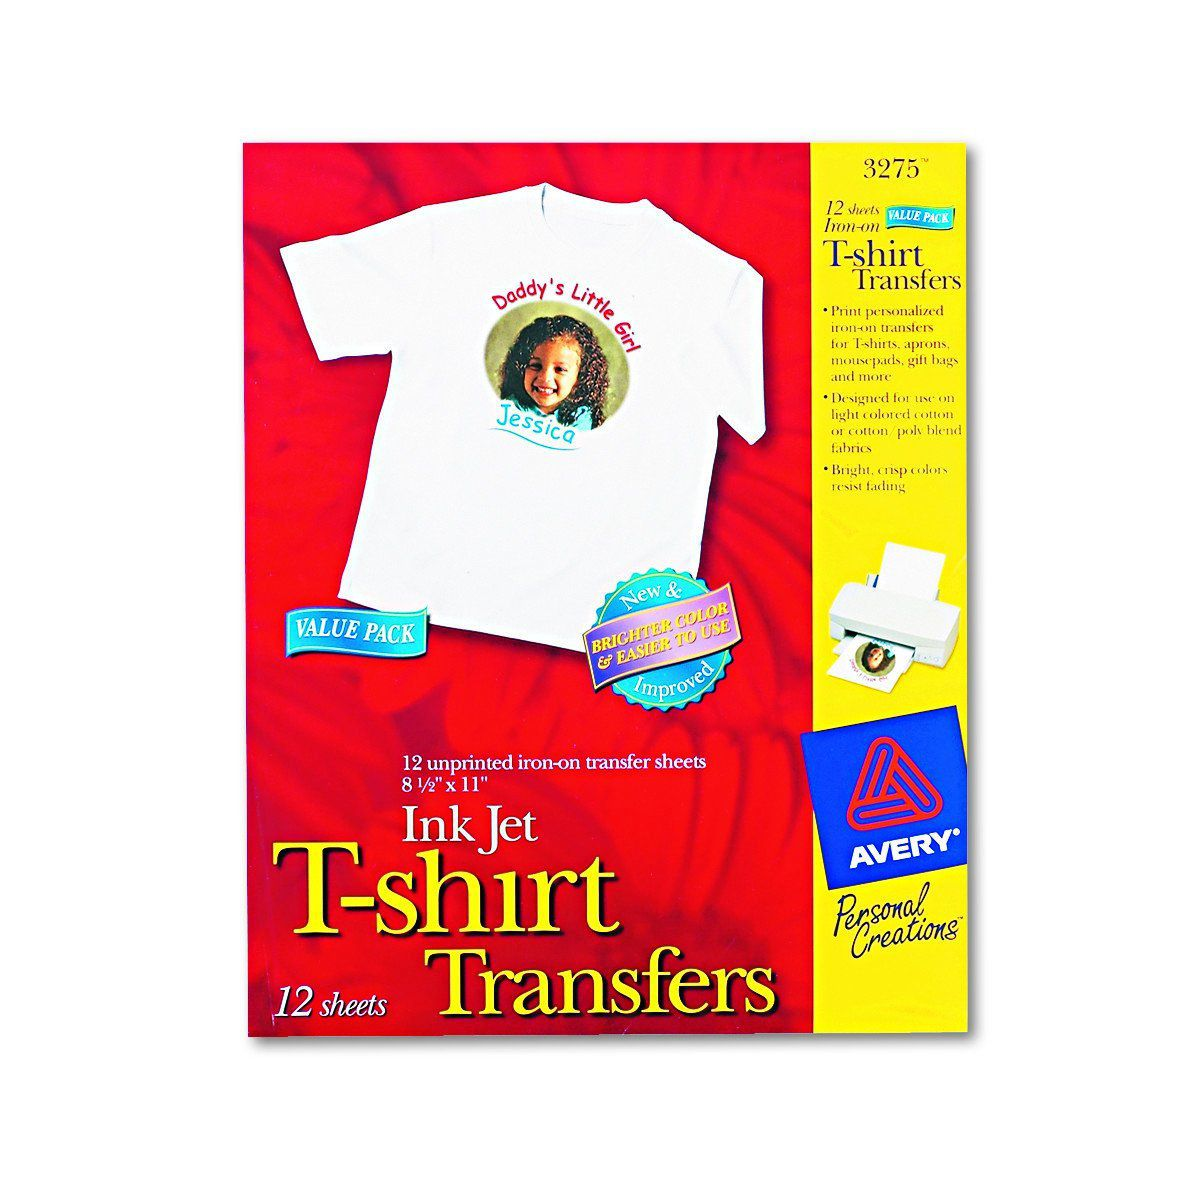 Avery T-Shirt Transfers for Inkjet Printers